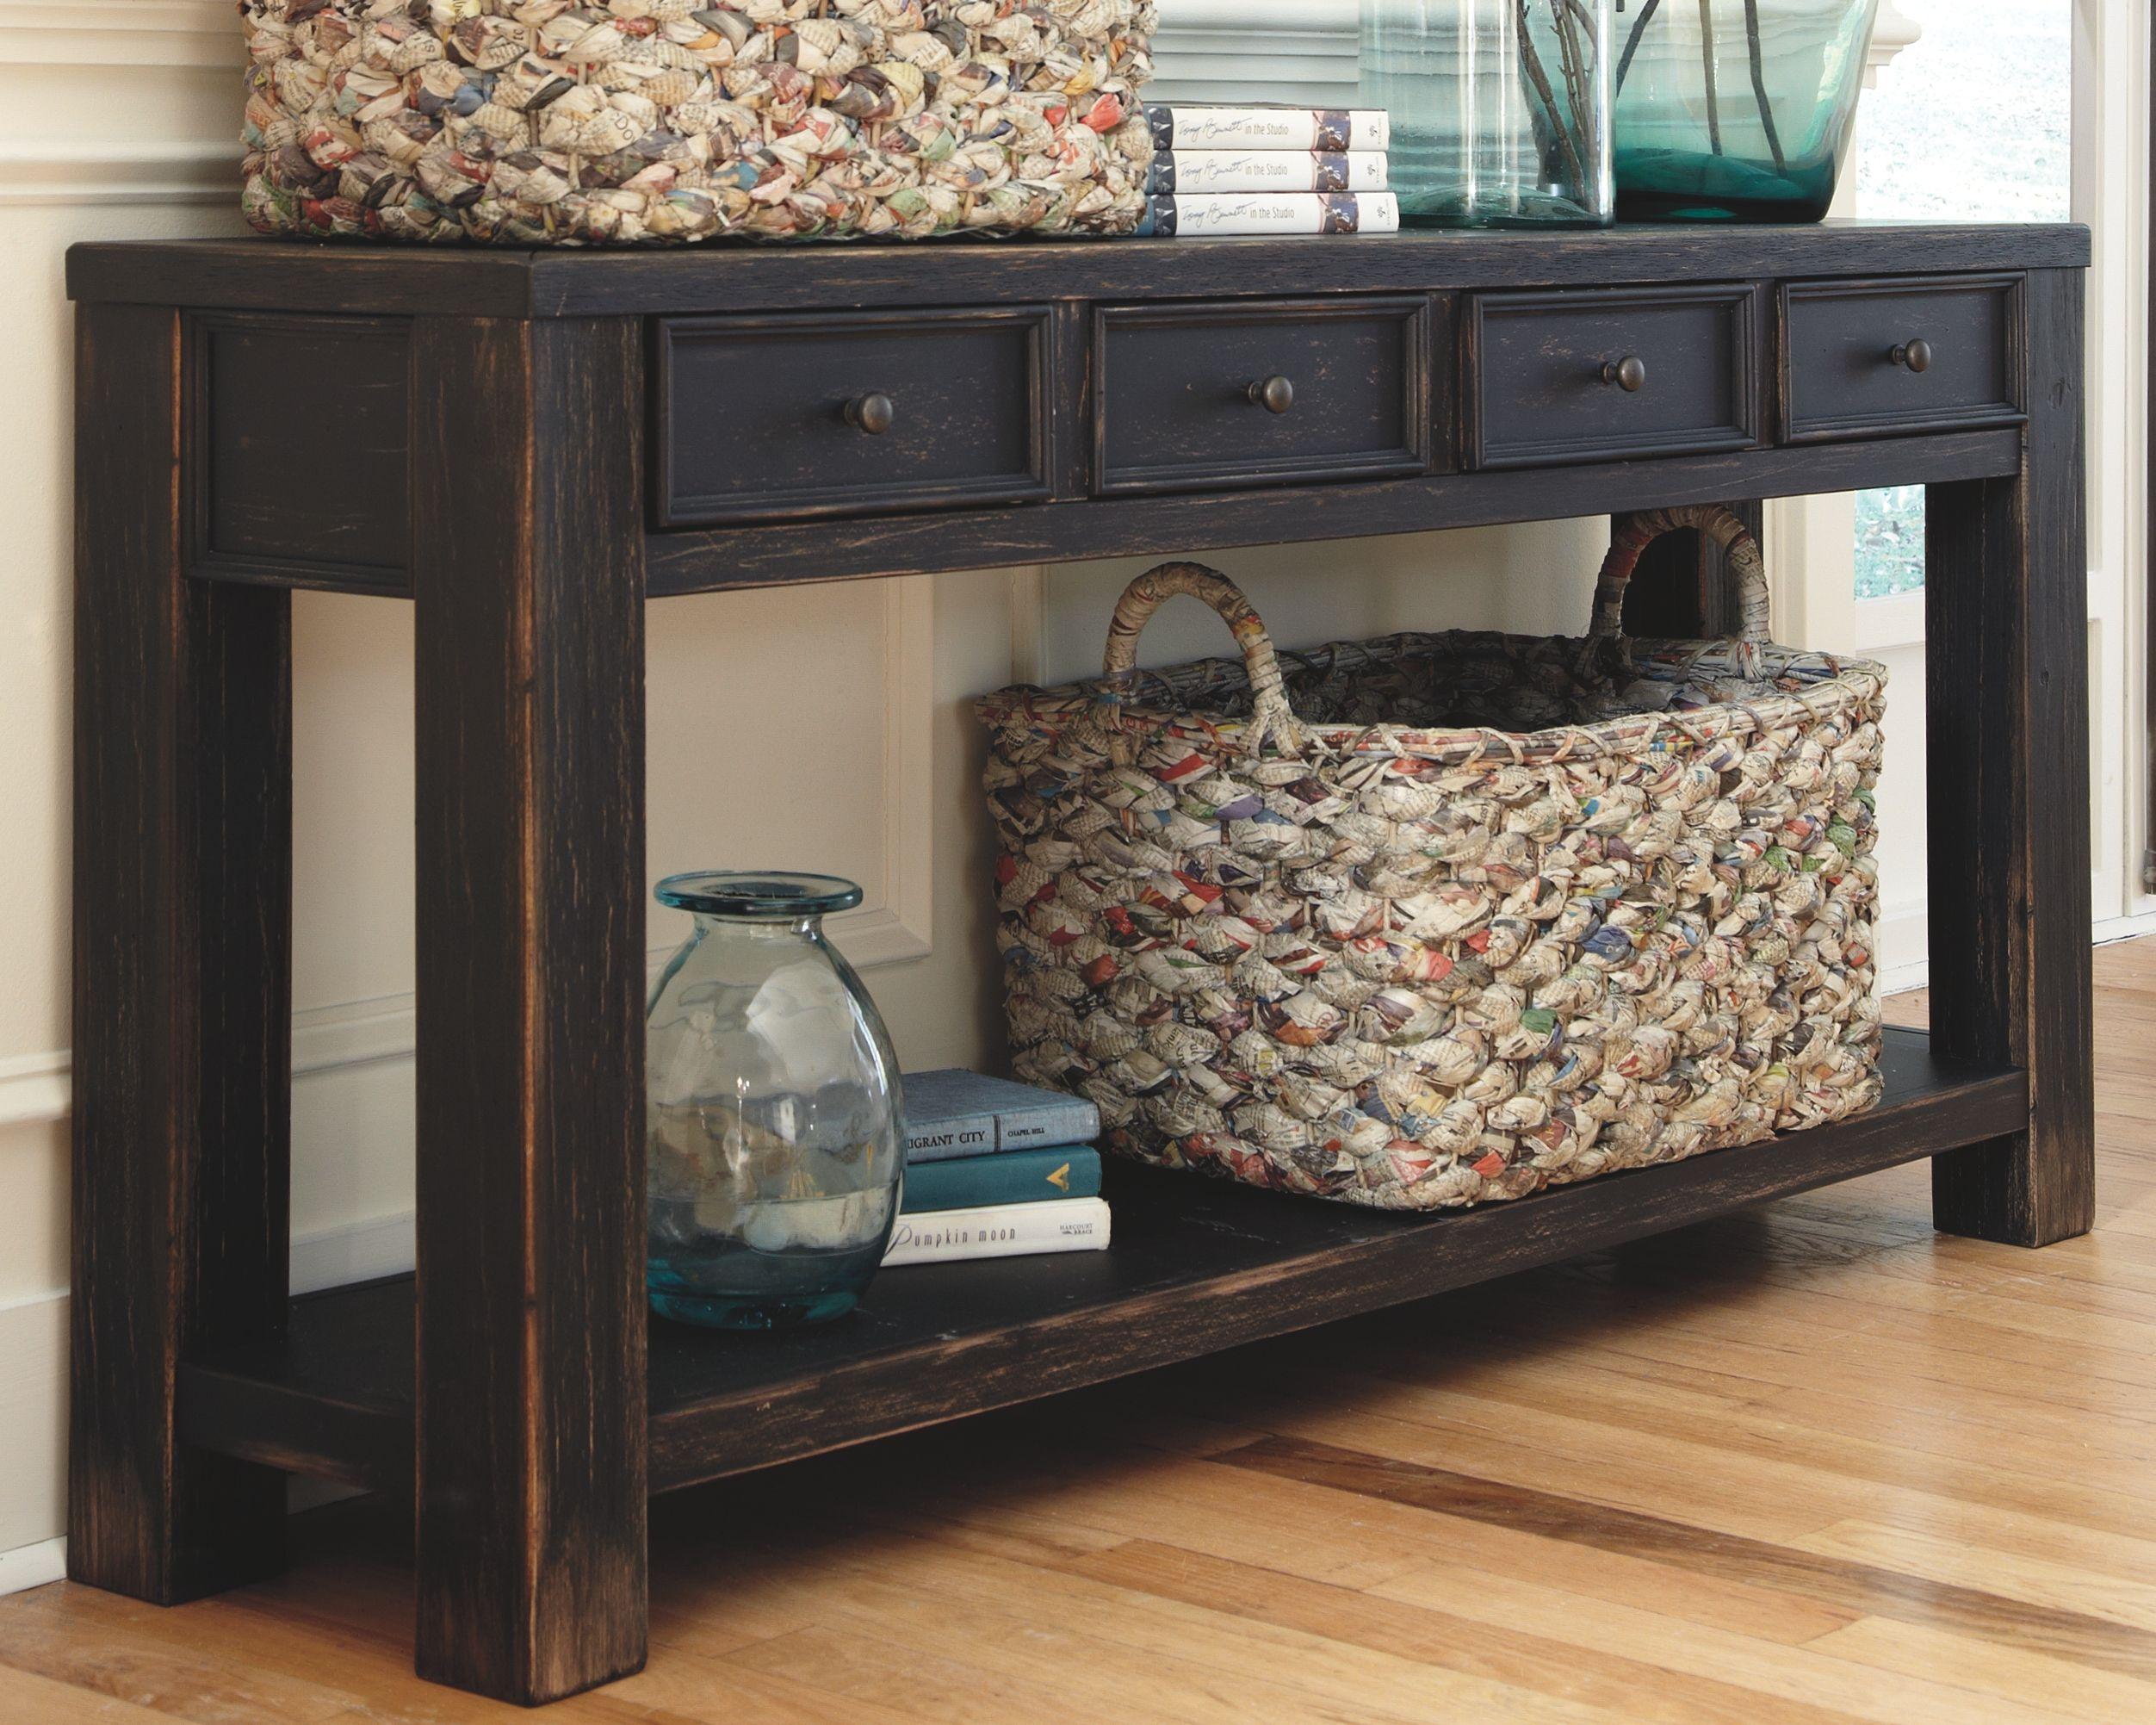 Gavelston Sofa Console Table Ashley Furniture Homestore Home Decor Black Sofa Table Room Decor